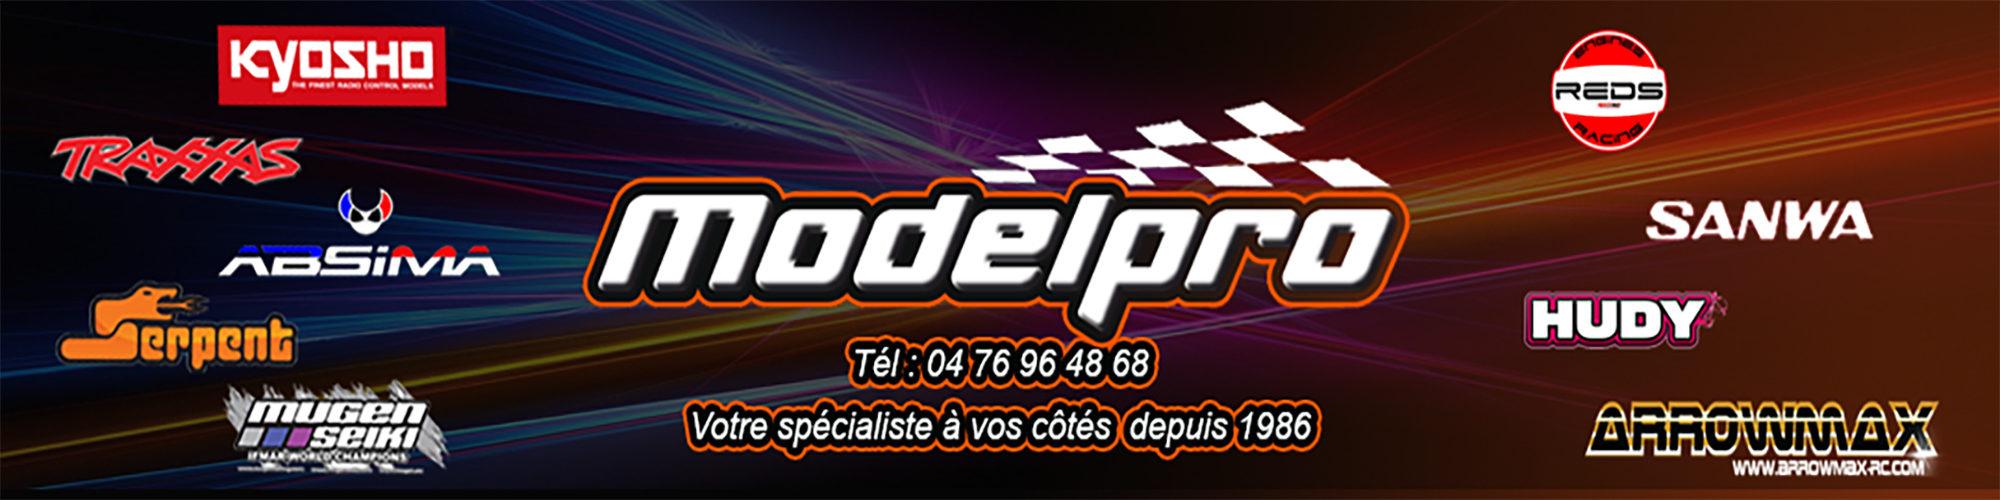 Modelpro – RC modélisme voiture avion